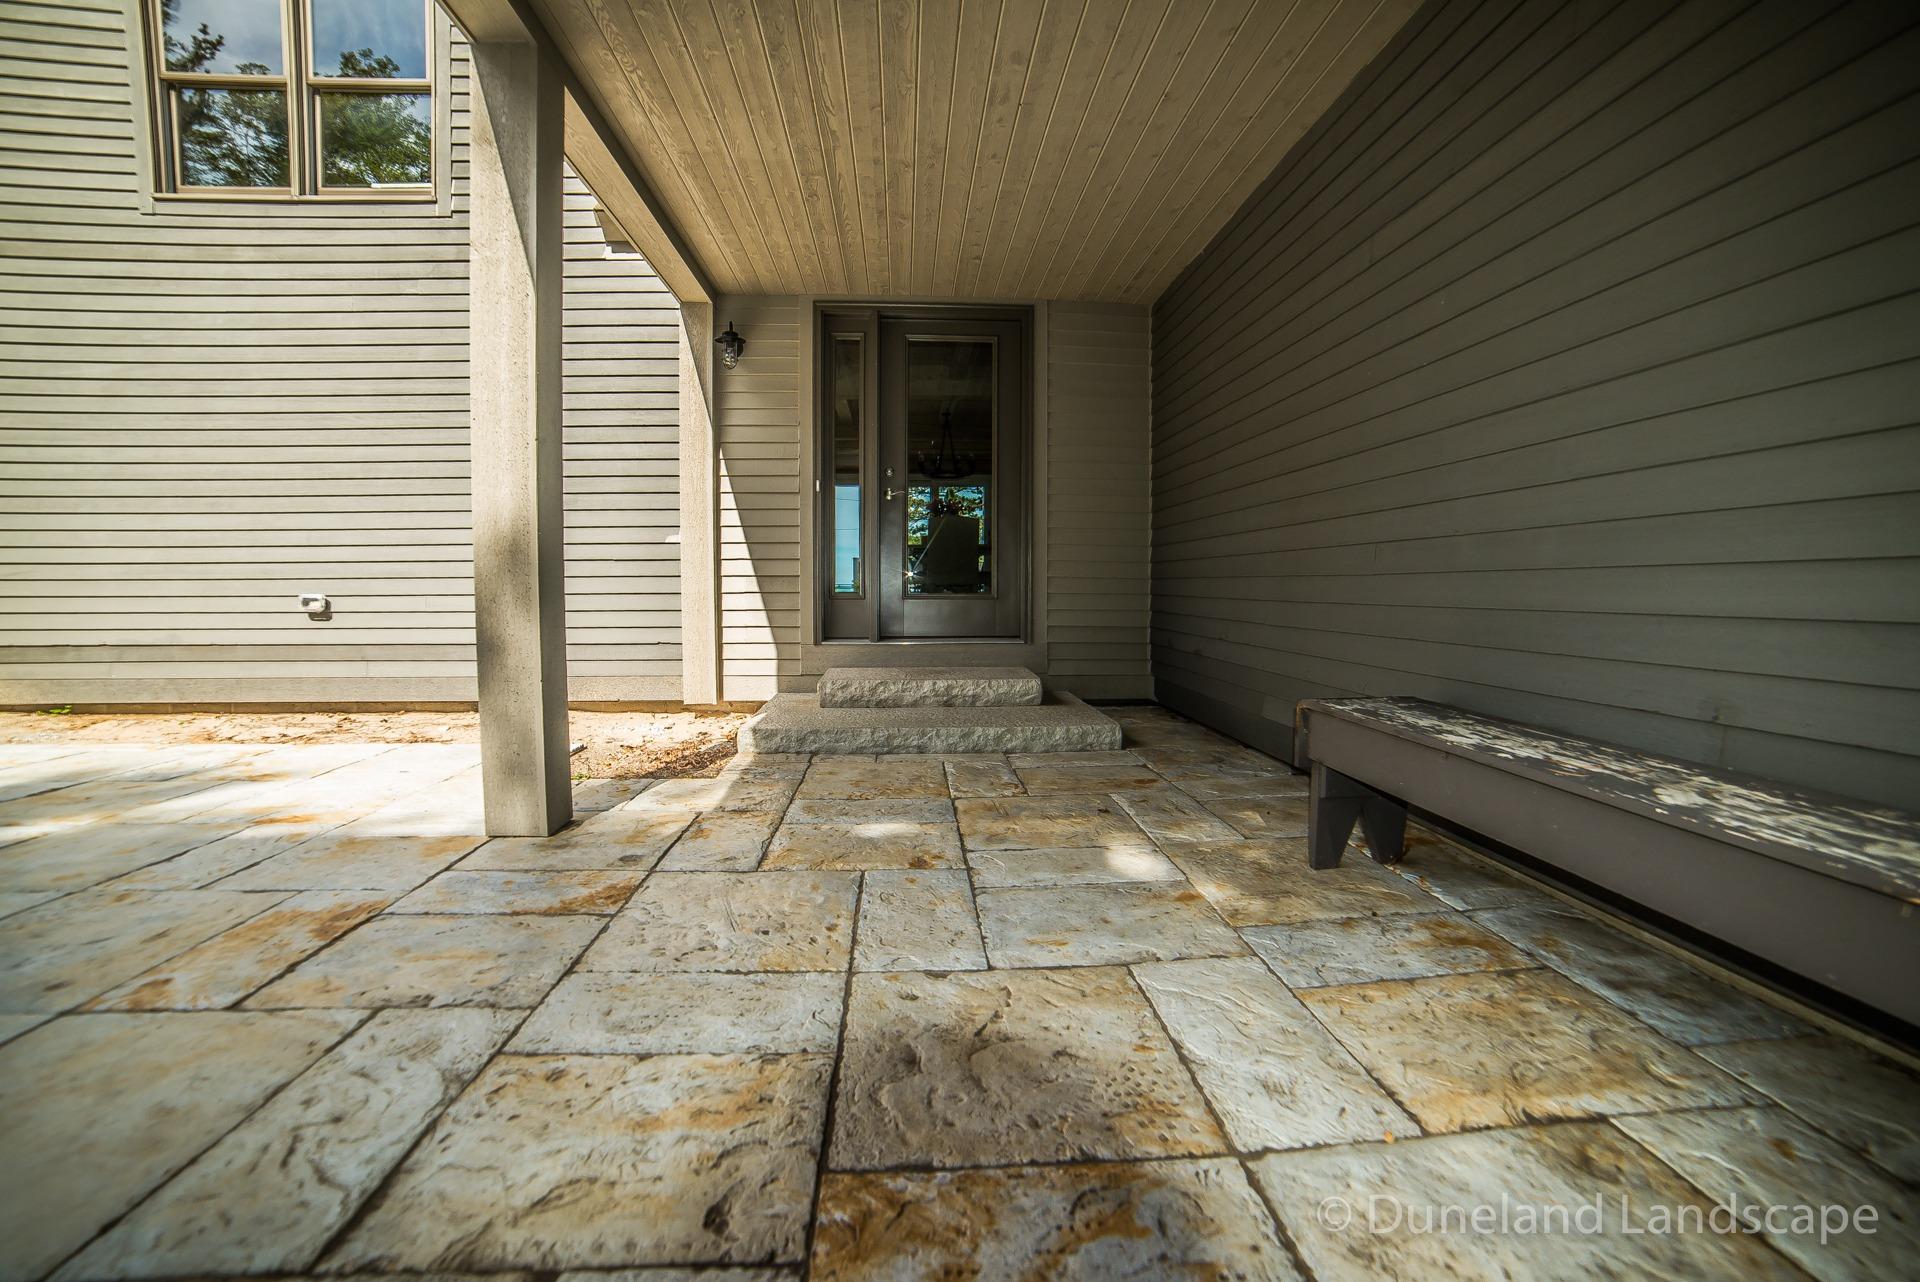 hardscape ideas for patio